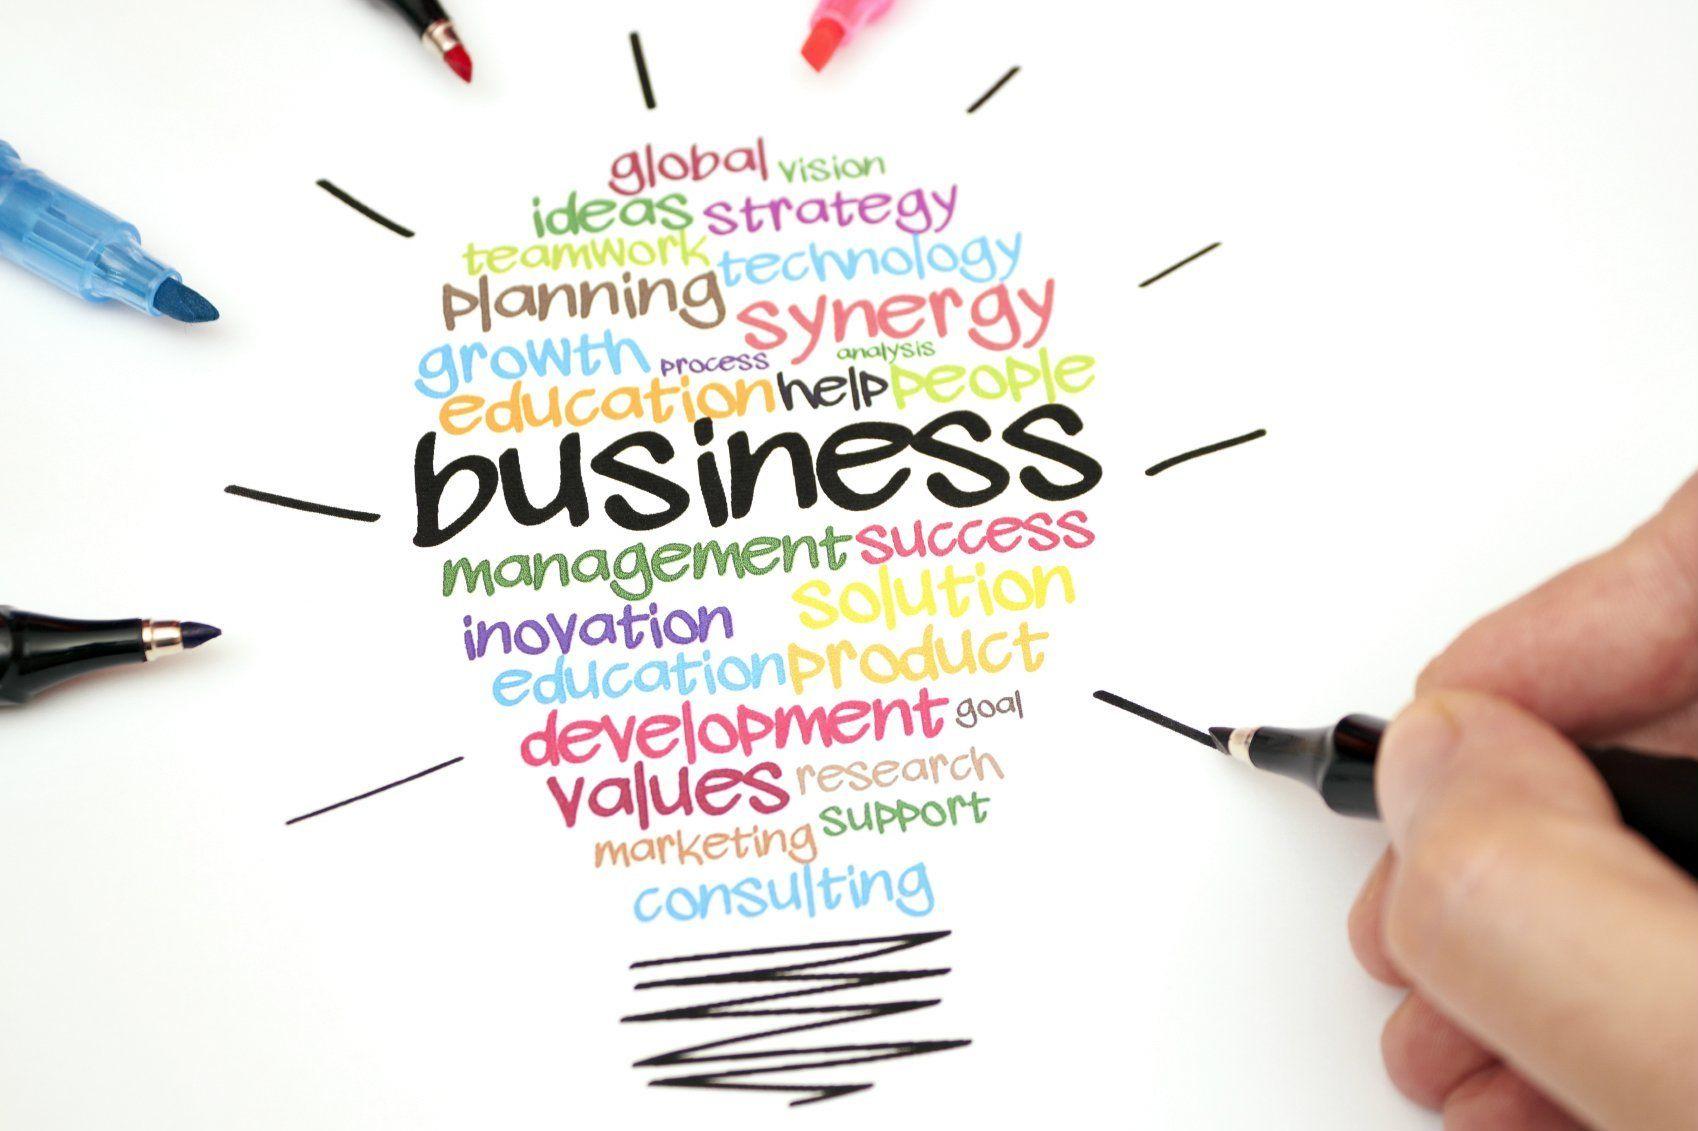 istock_000024934909medium-business